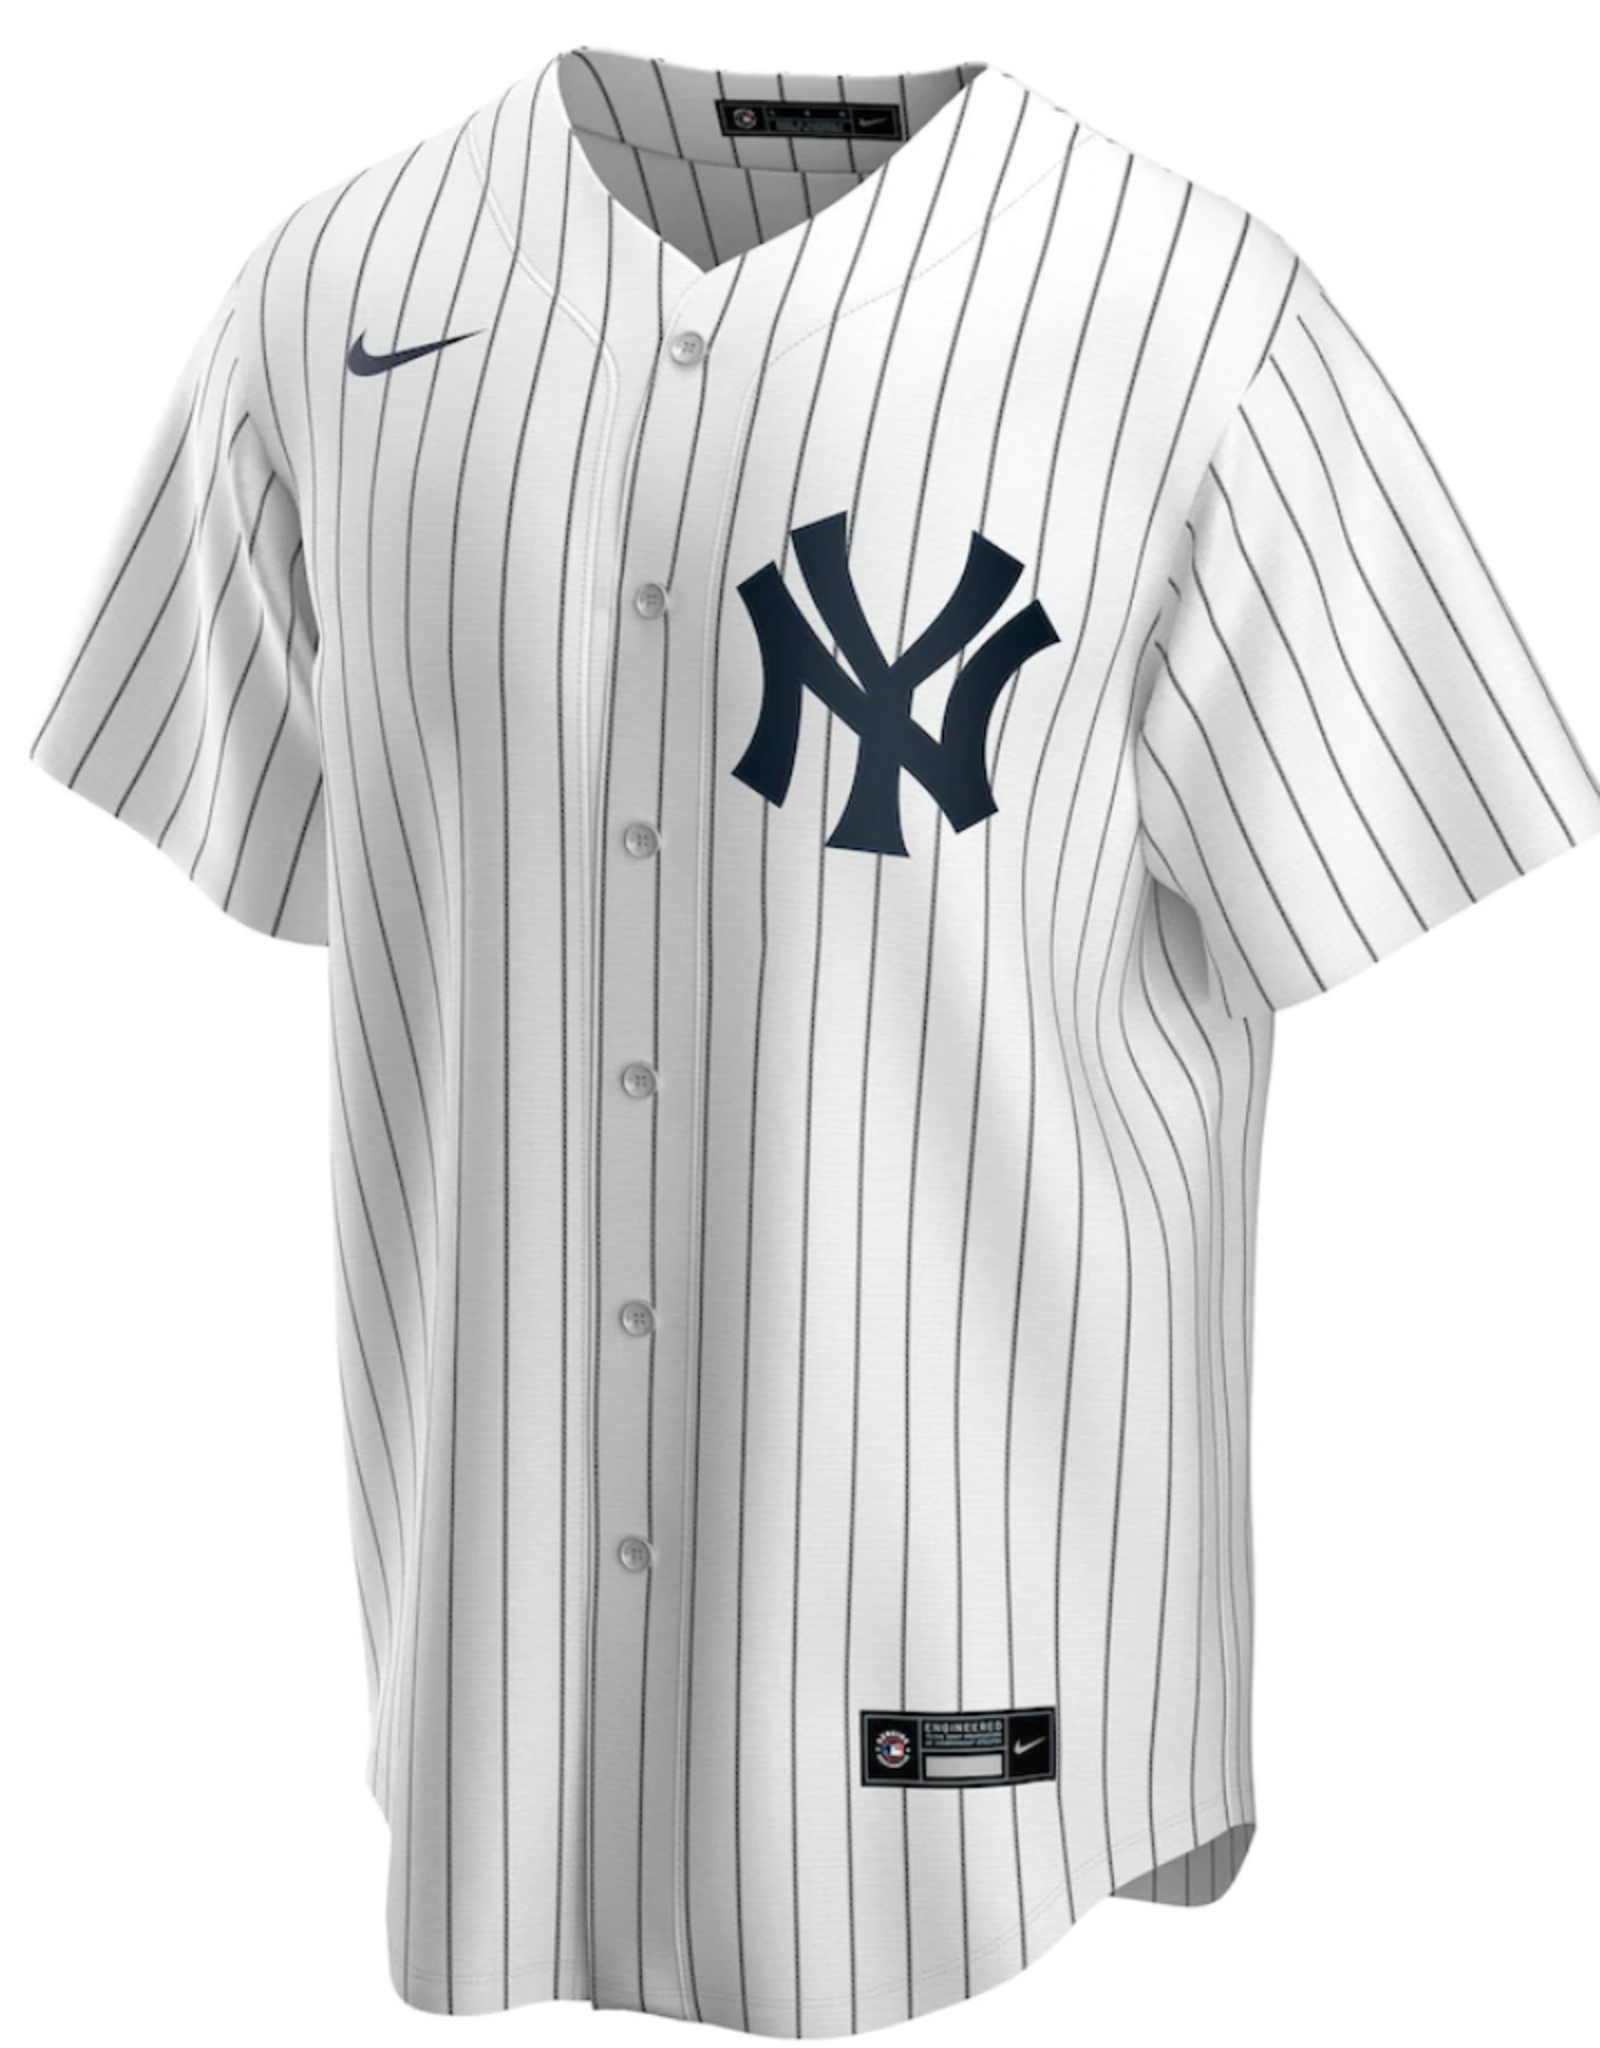 Nike Men's Home Replica Jersey New York Yankees White